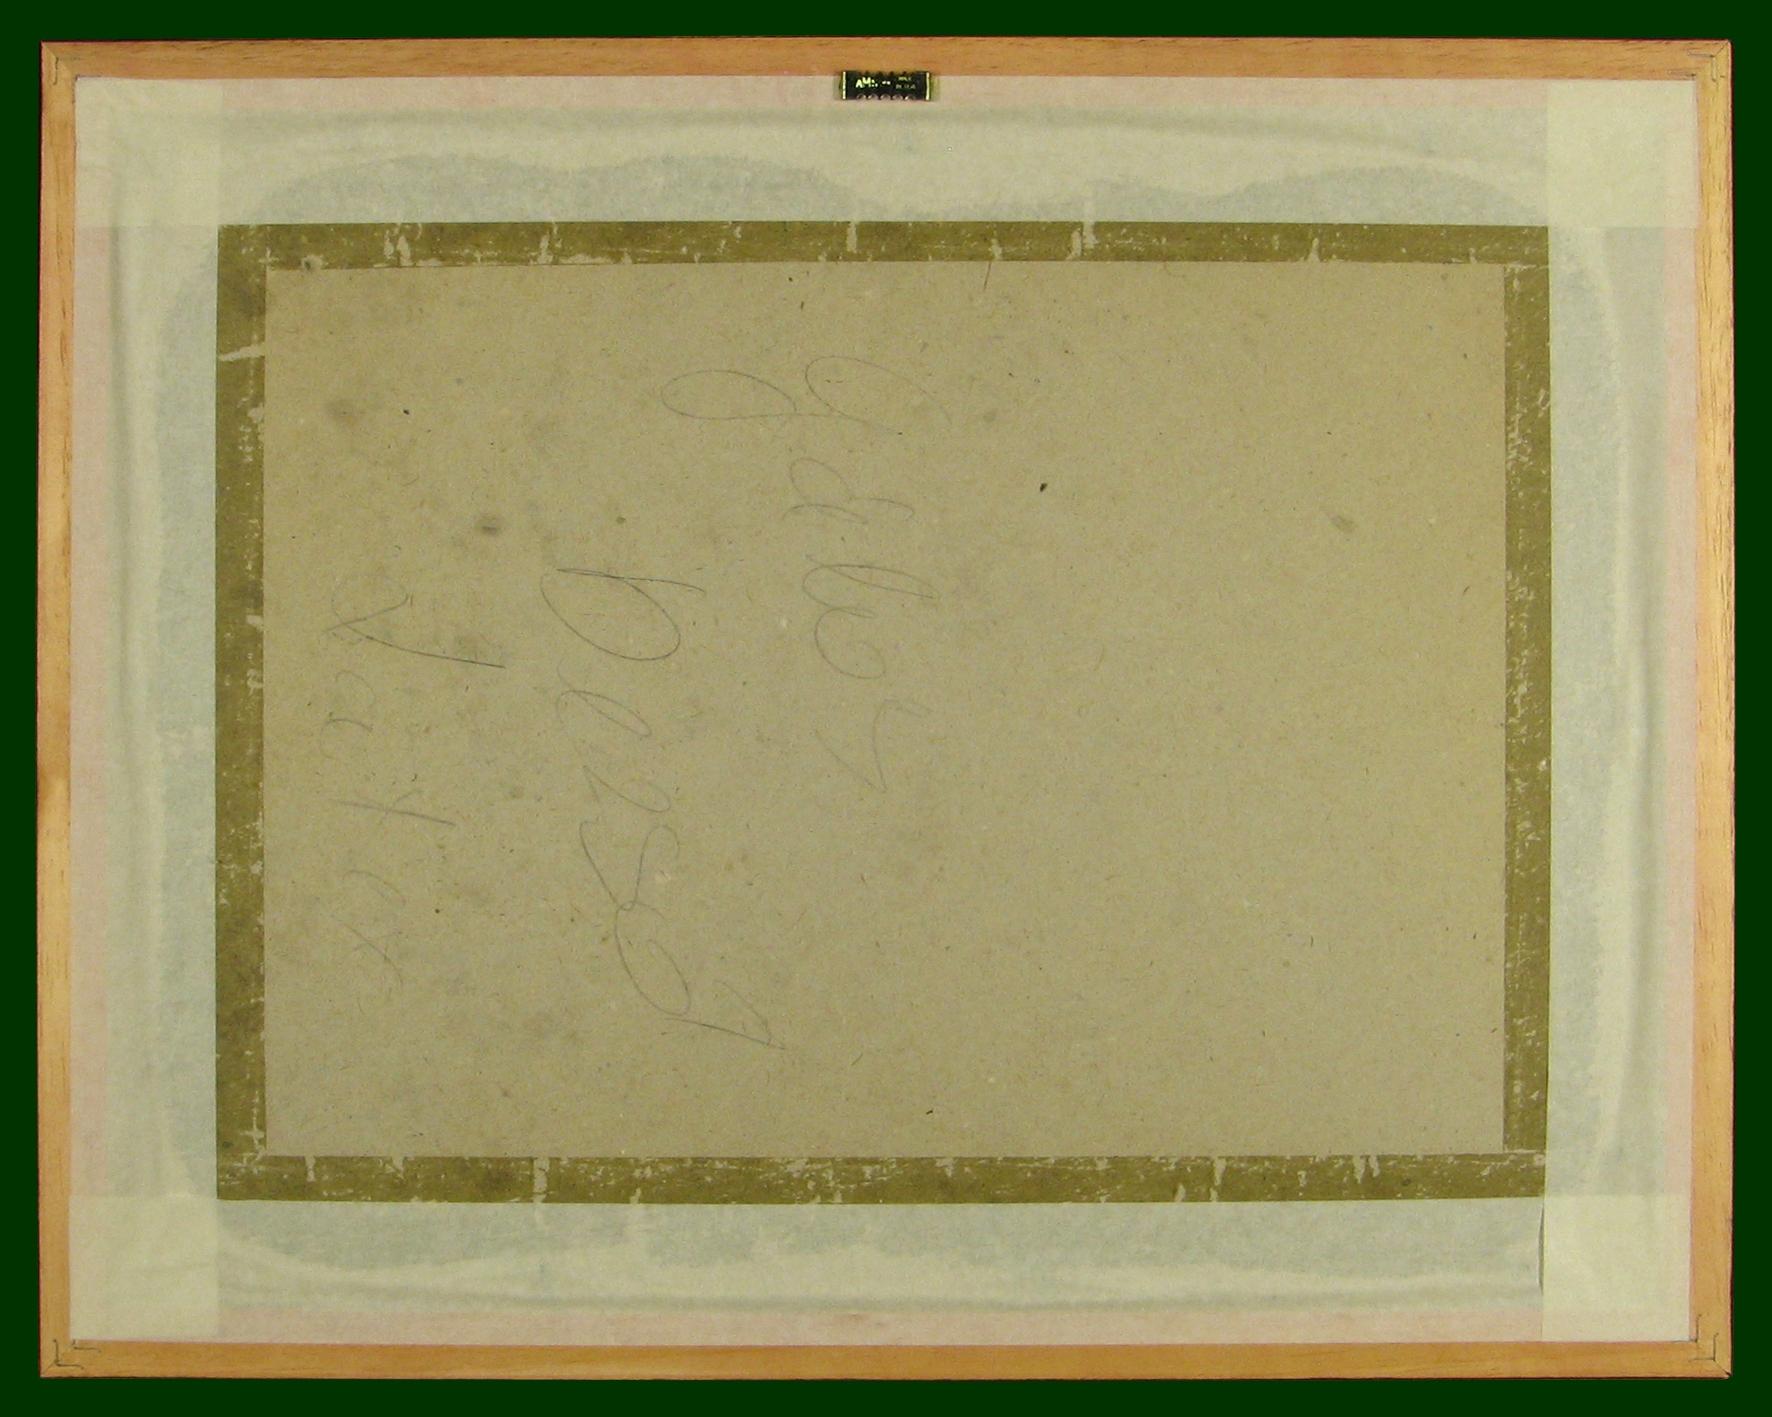 102-16h_t.jpg (1772×1417)